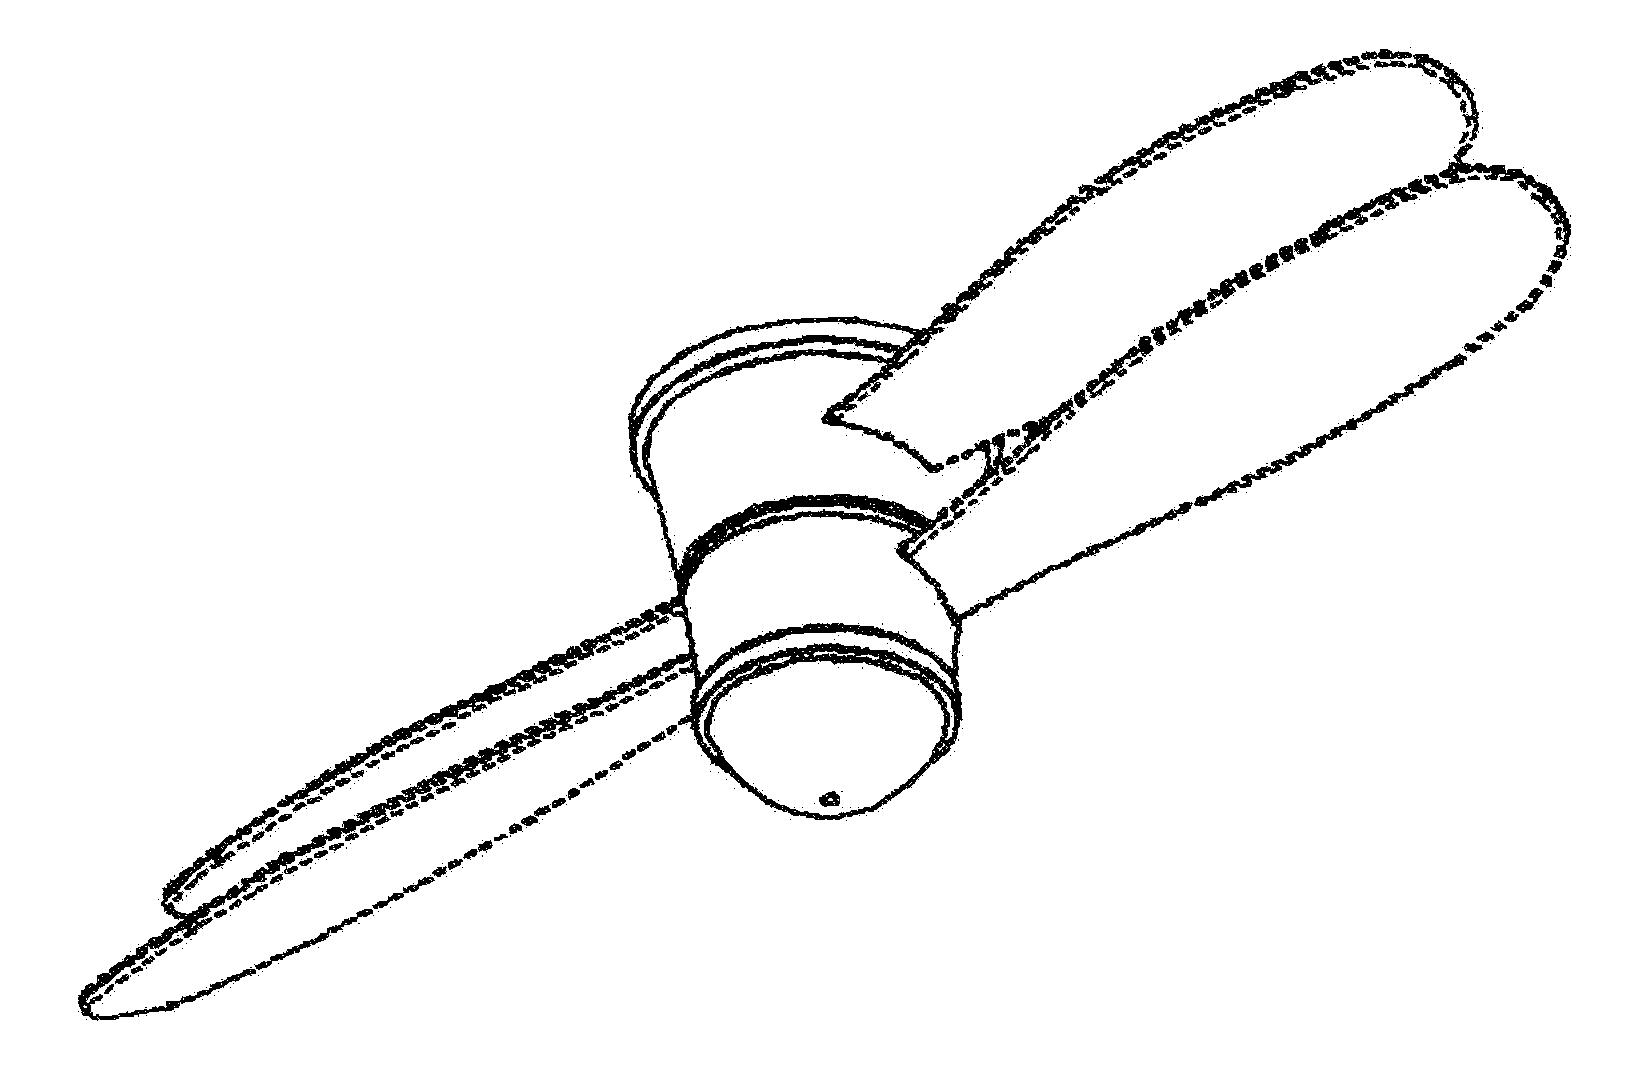 Fan Blade Drawing : Patent usd dual blade ceiling fan google patents